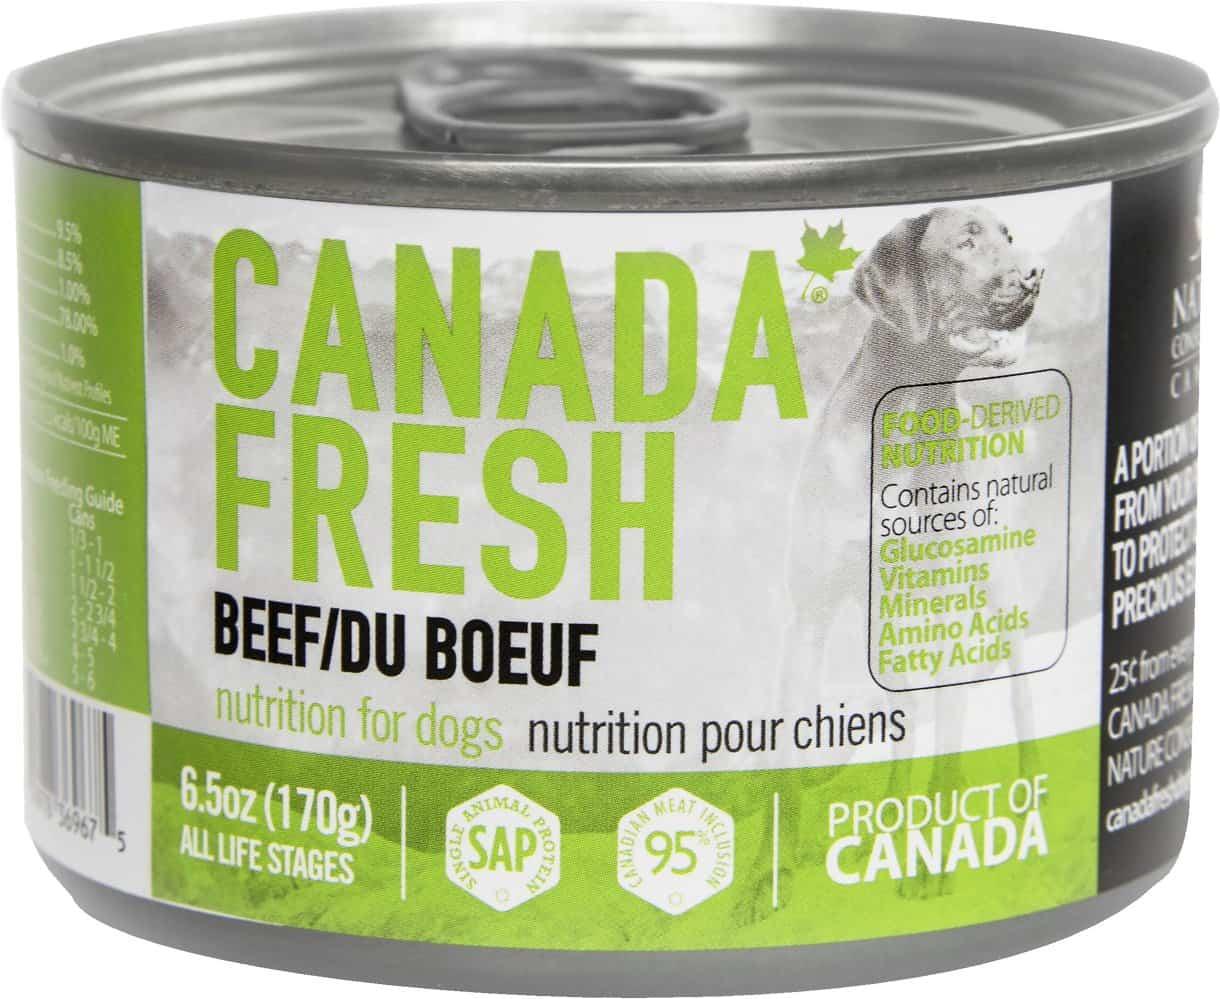 Canada Fresh Dog Food Reviews, Recalls & Coupons [year] 14